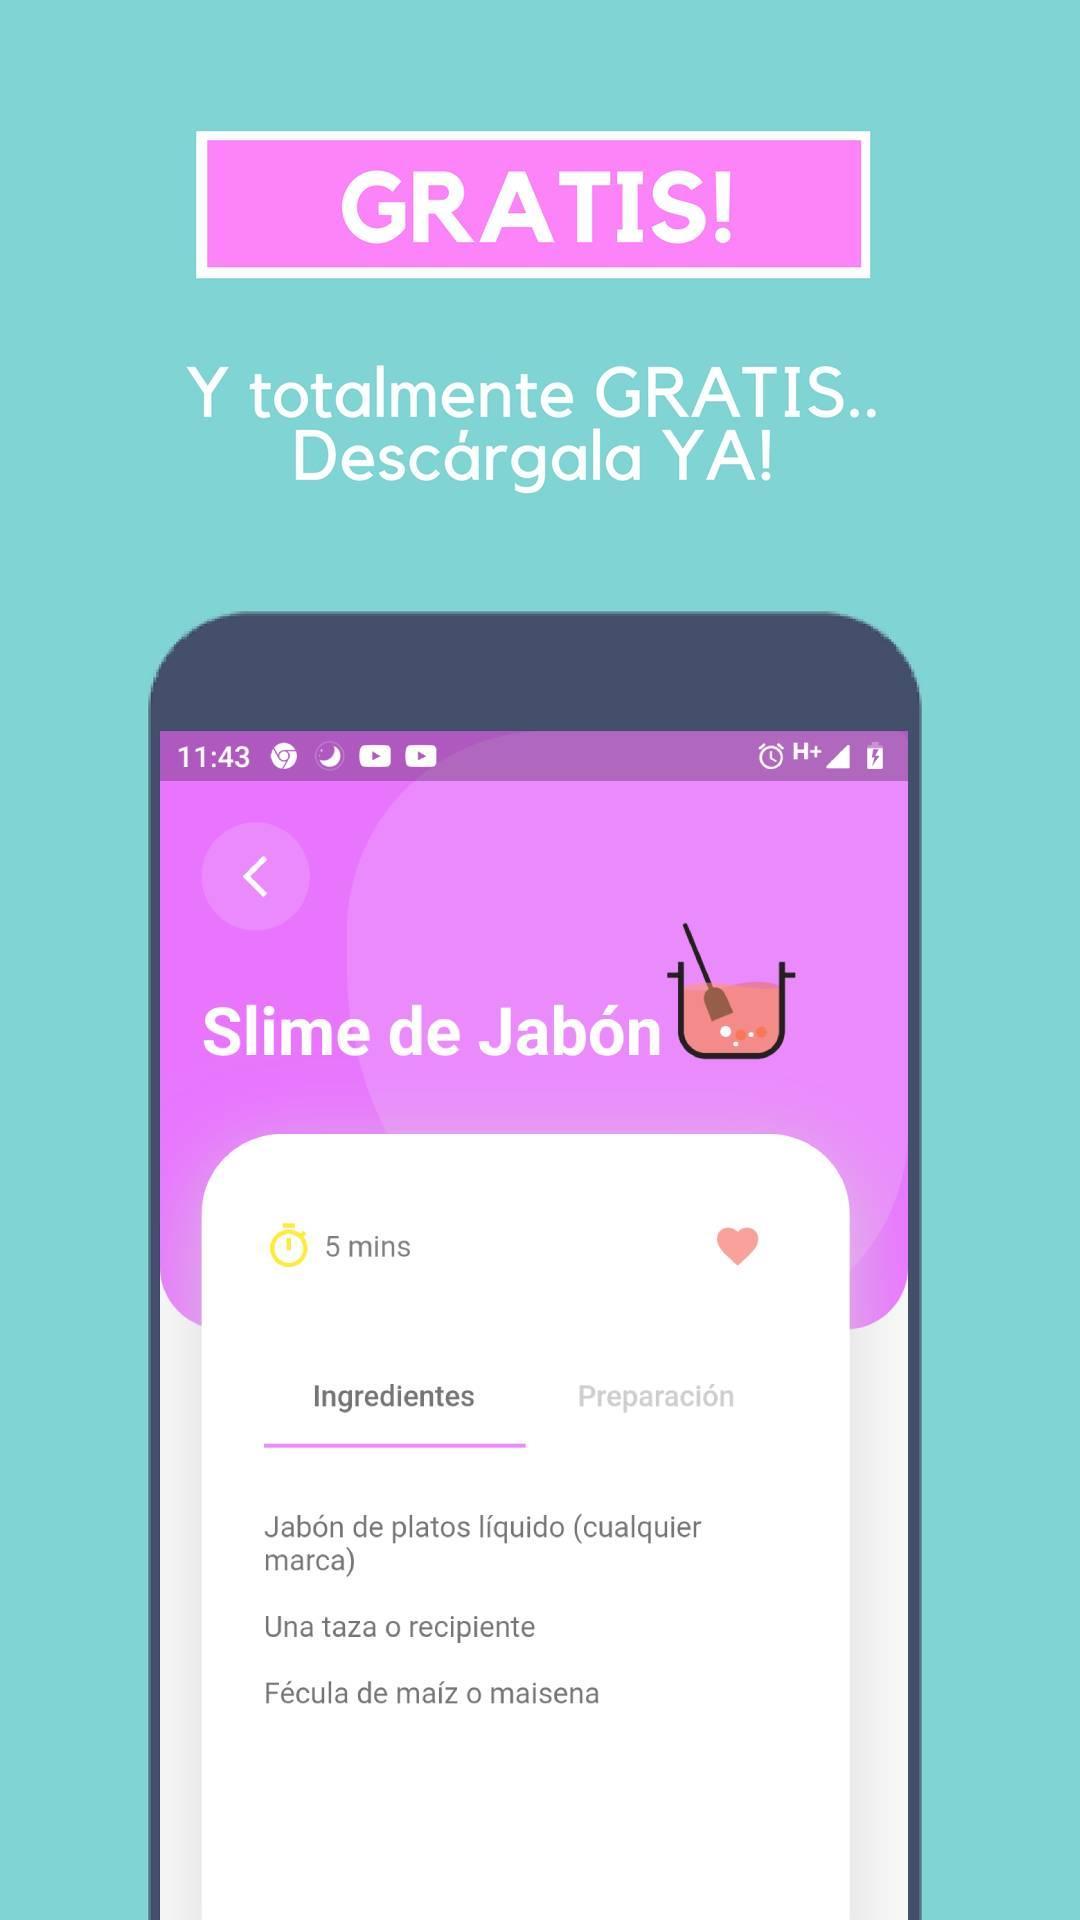 Como Hacer Slime Sin Pegamento Paso A Paso For Android Apk Download